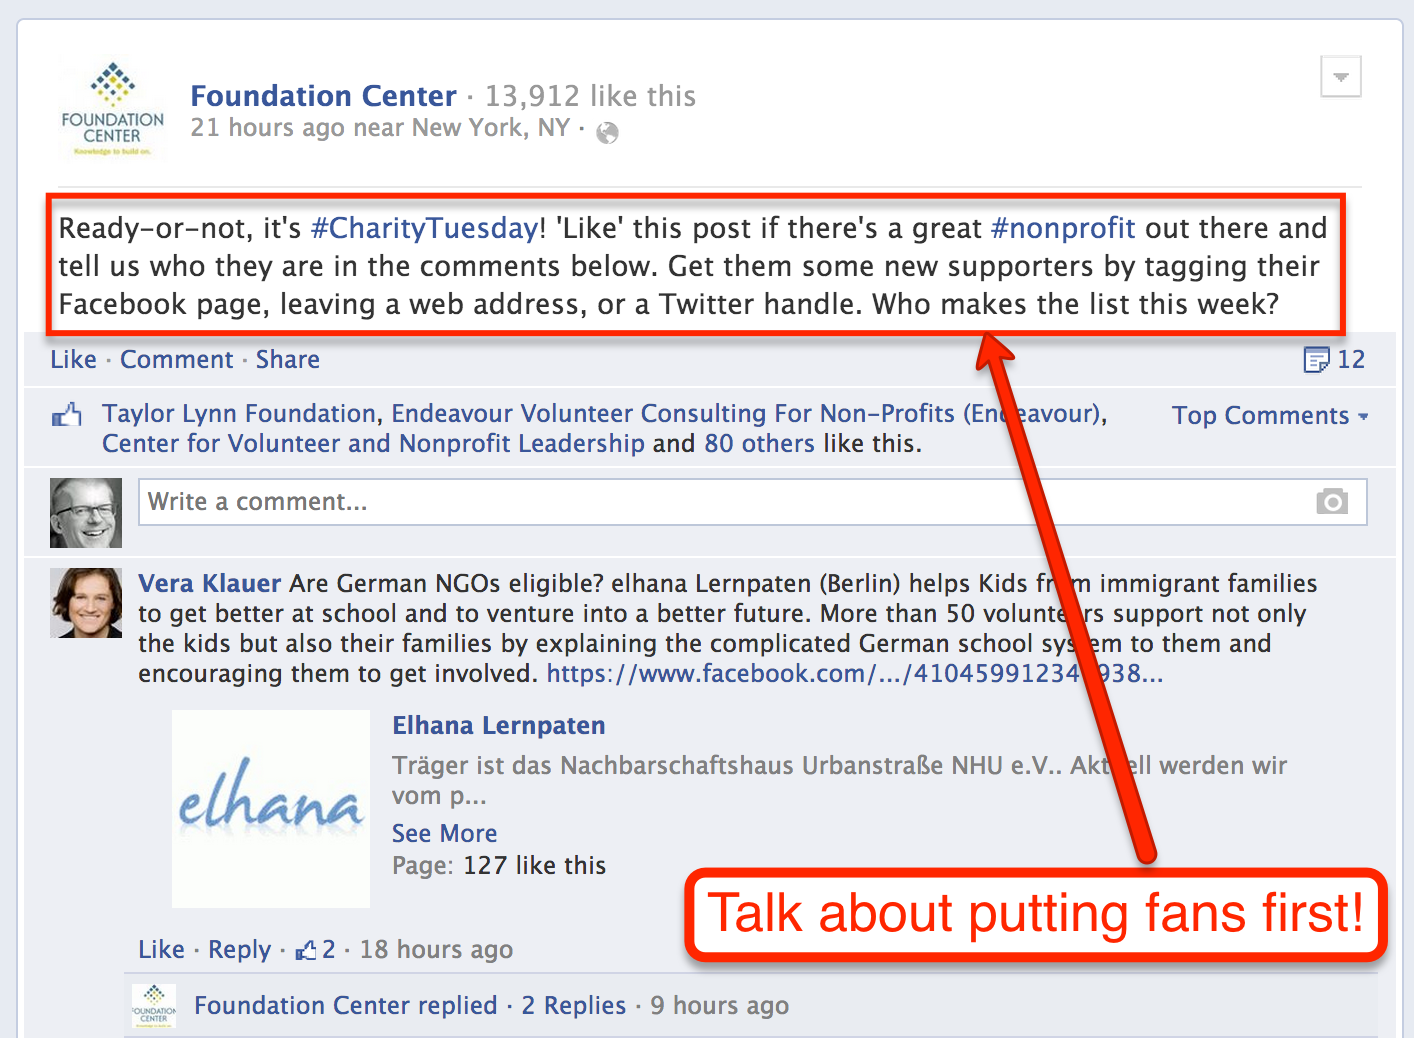 Foundation Center Foundation Web Address Facebook Updates